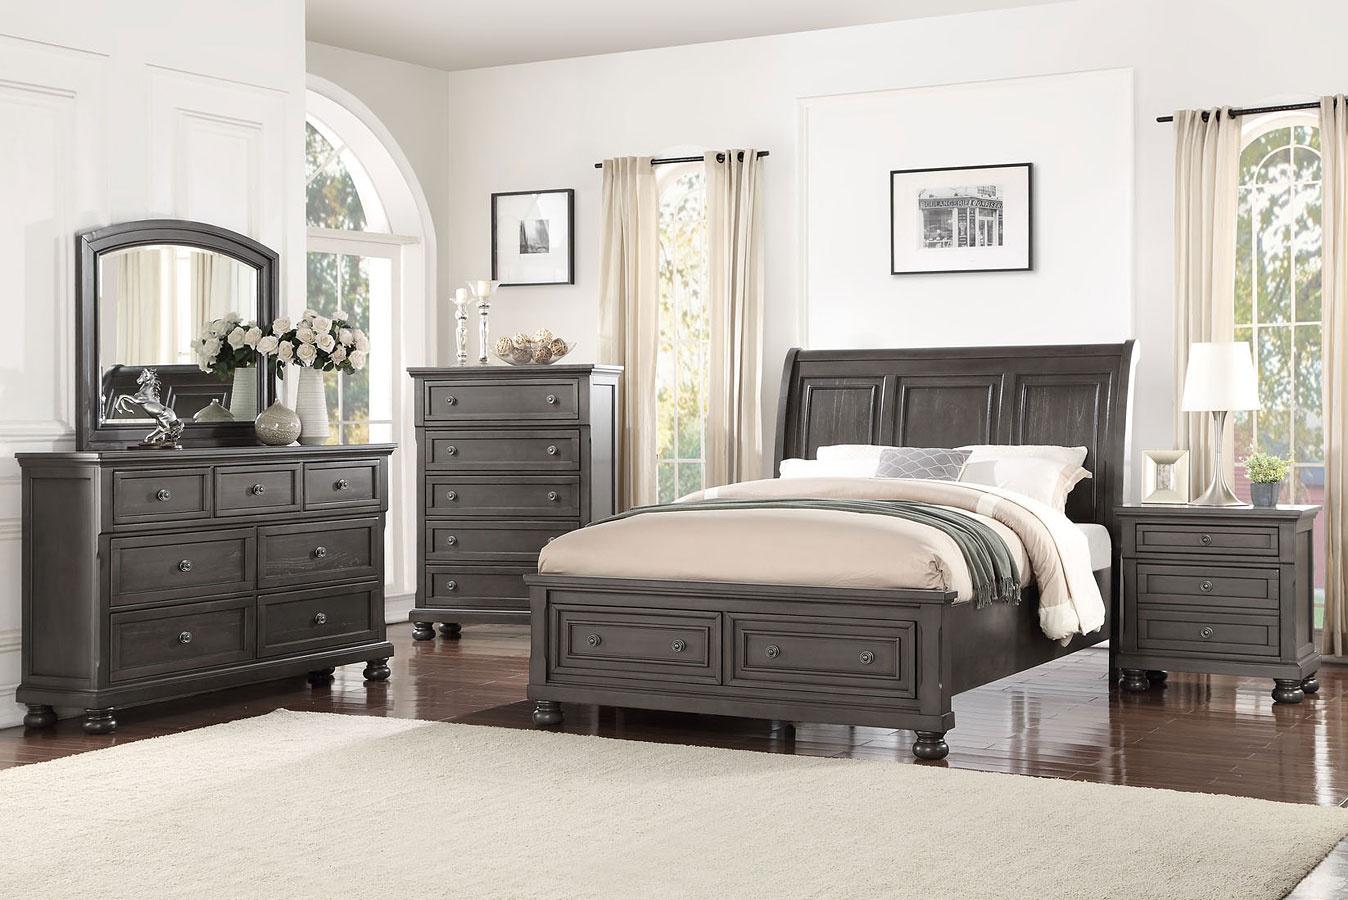 Soriah Bedroom set B1061X by Avalon